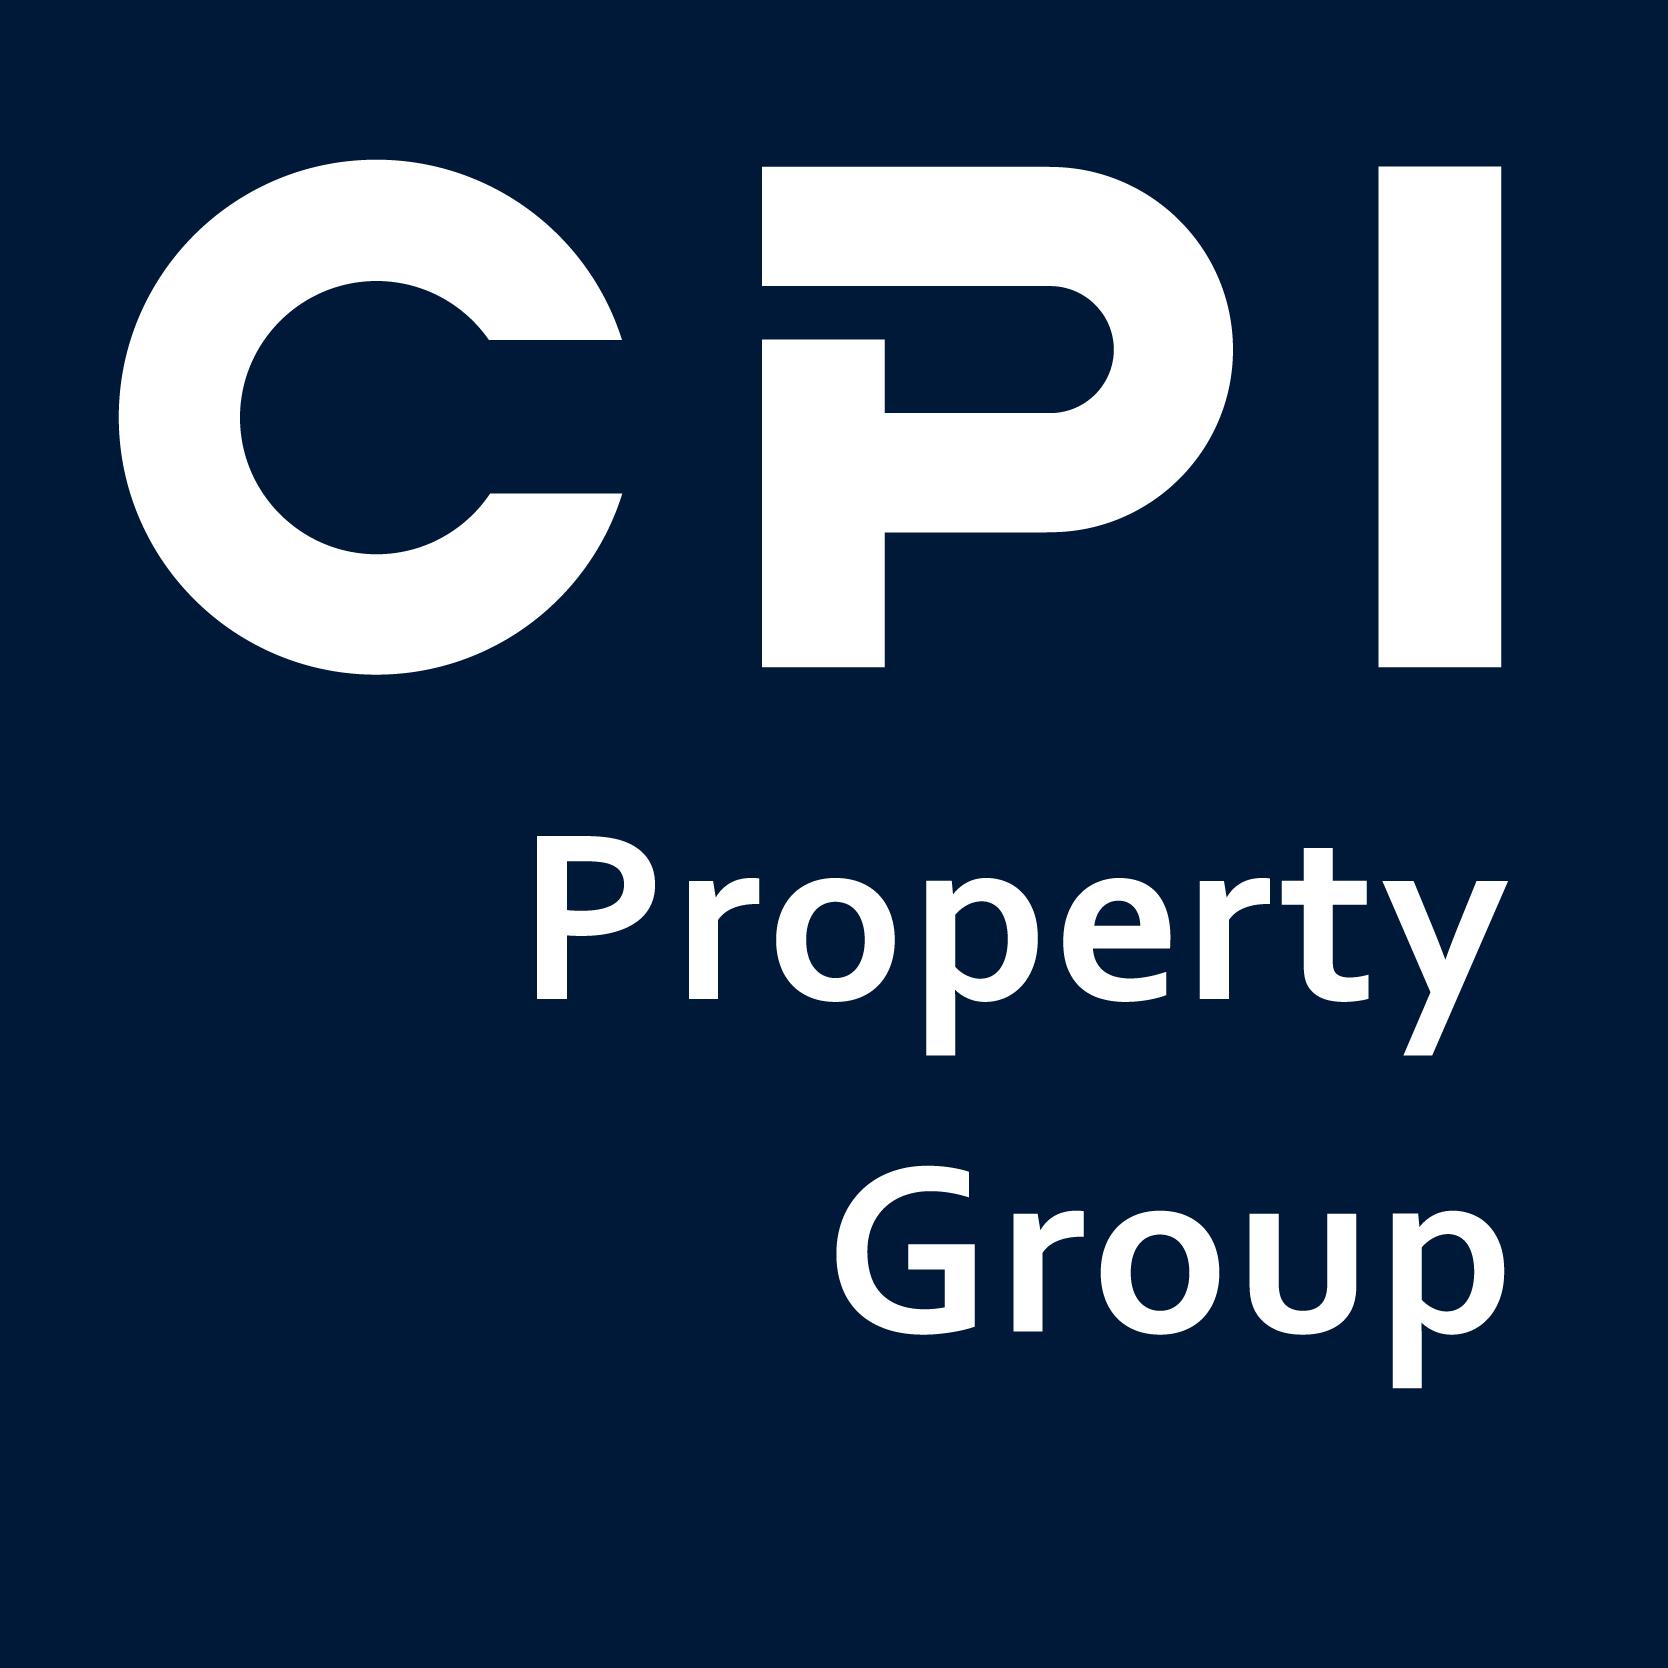 CPI Property Group